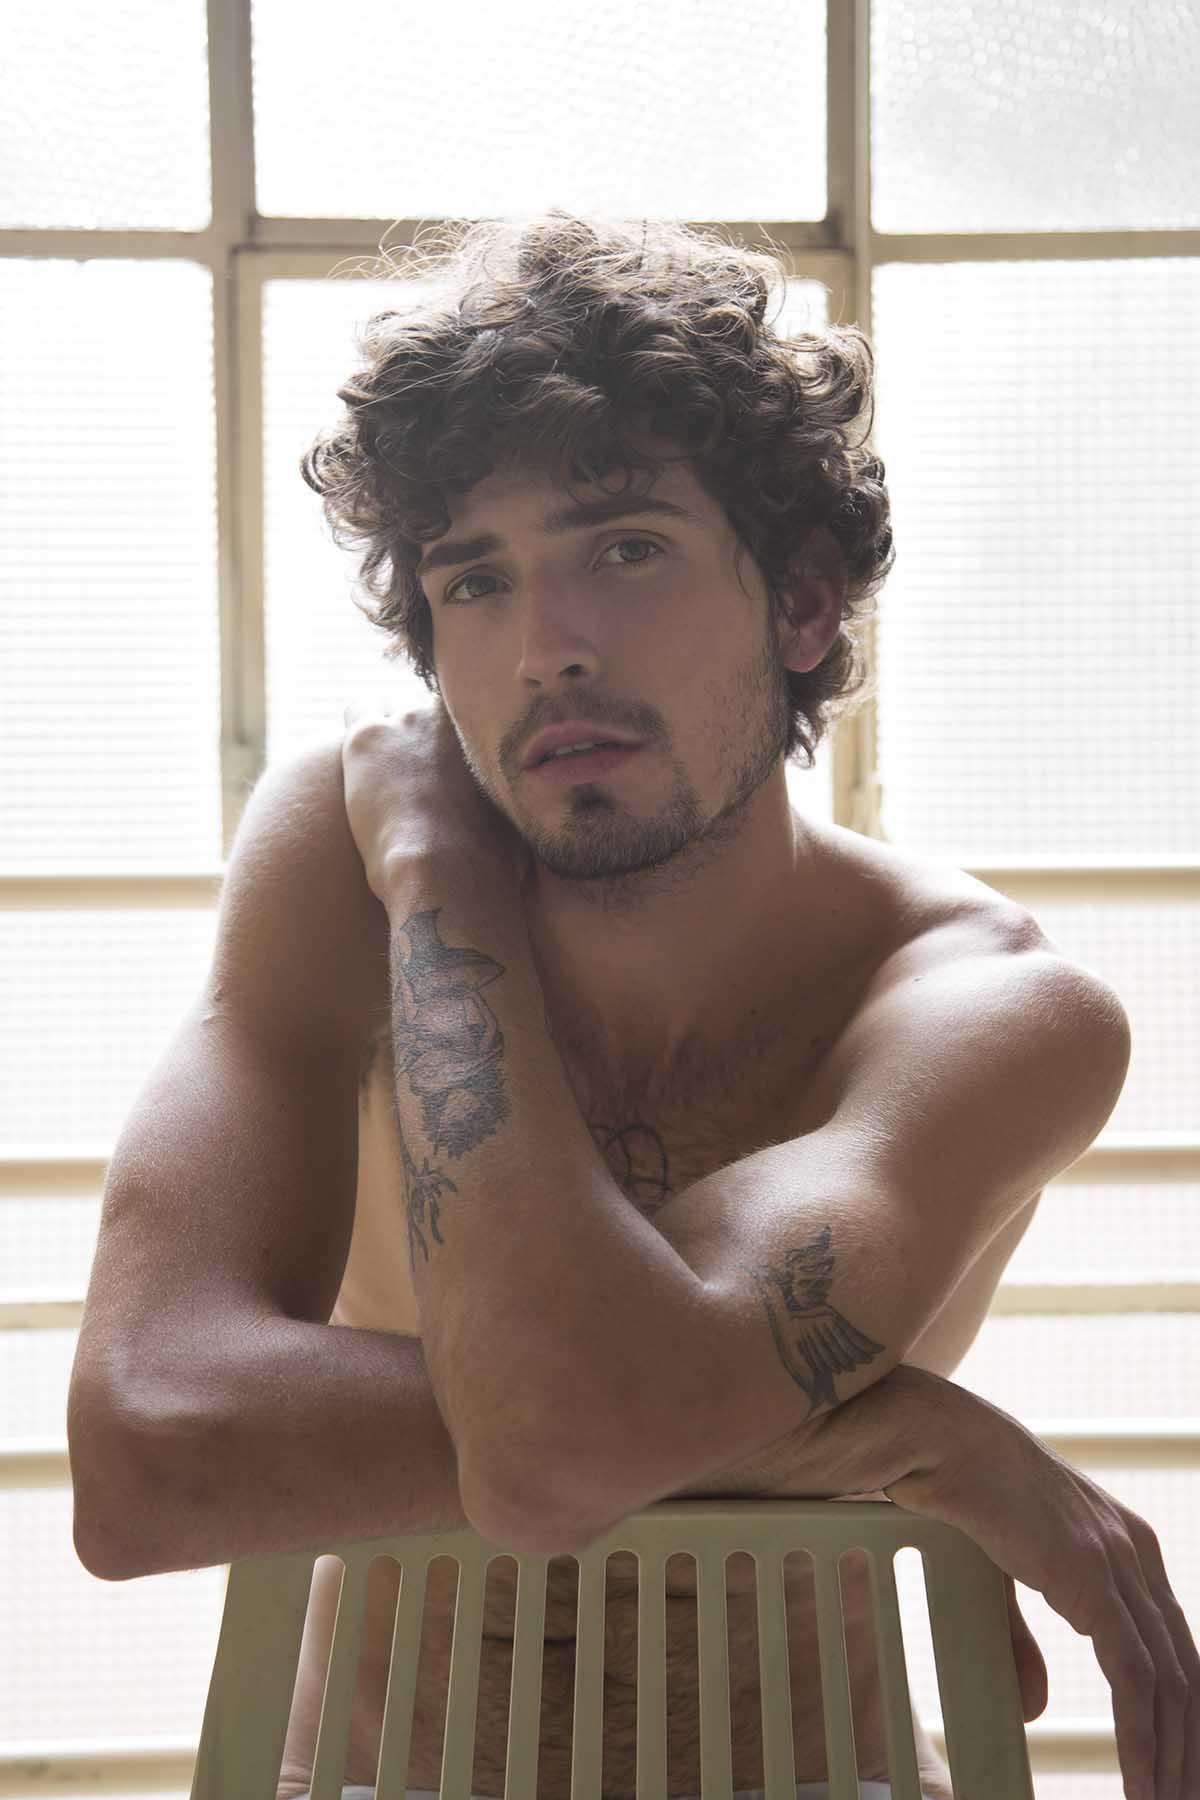 Helvecio Melato by Filipe Galgani for Brazilian Male Model